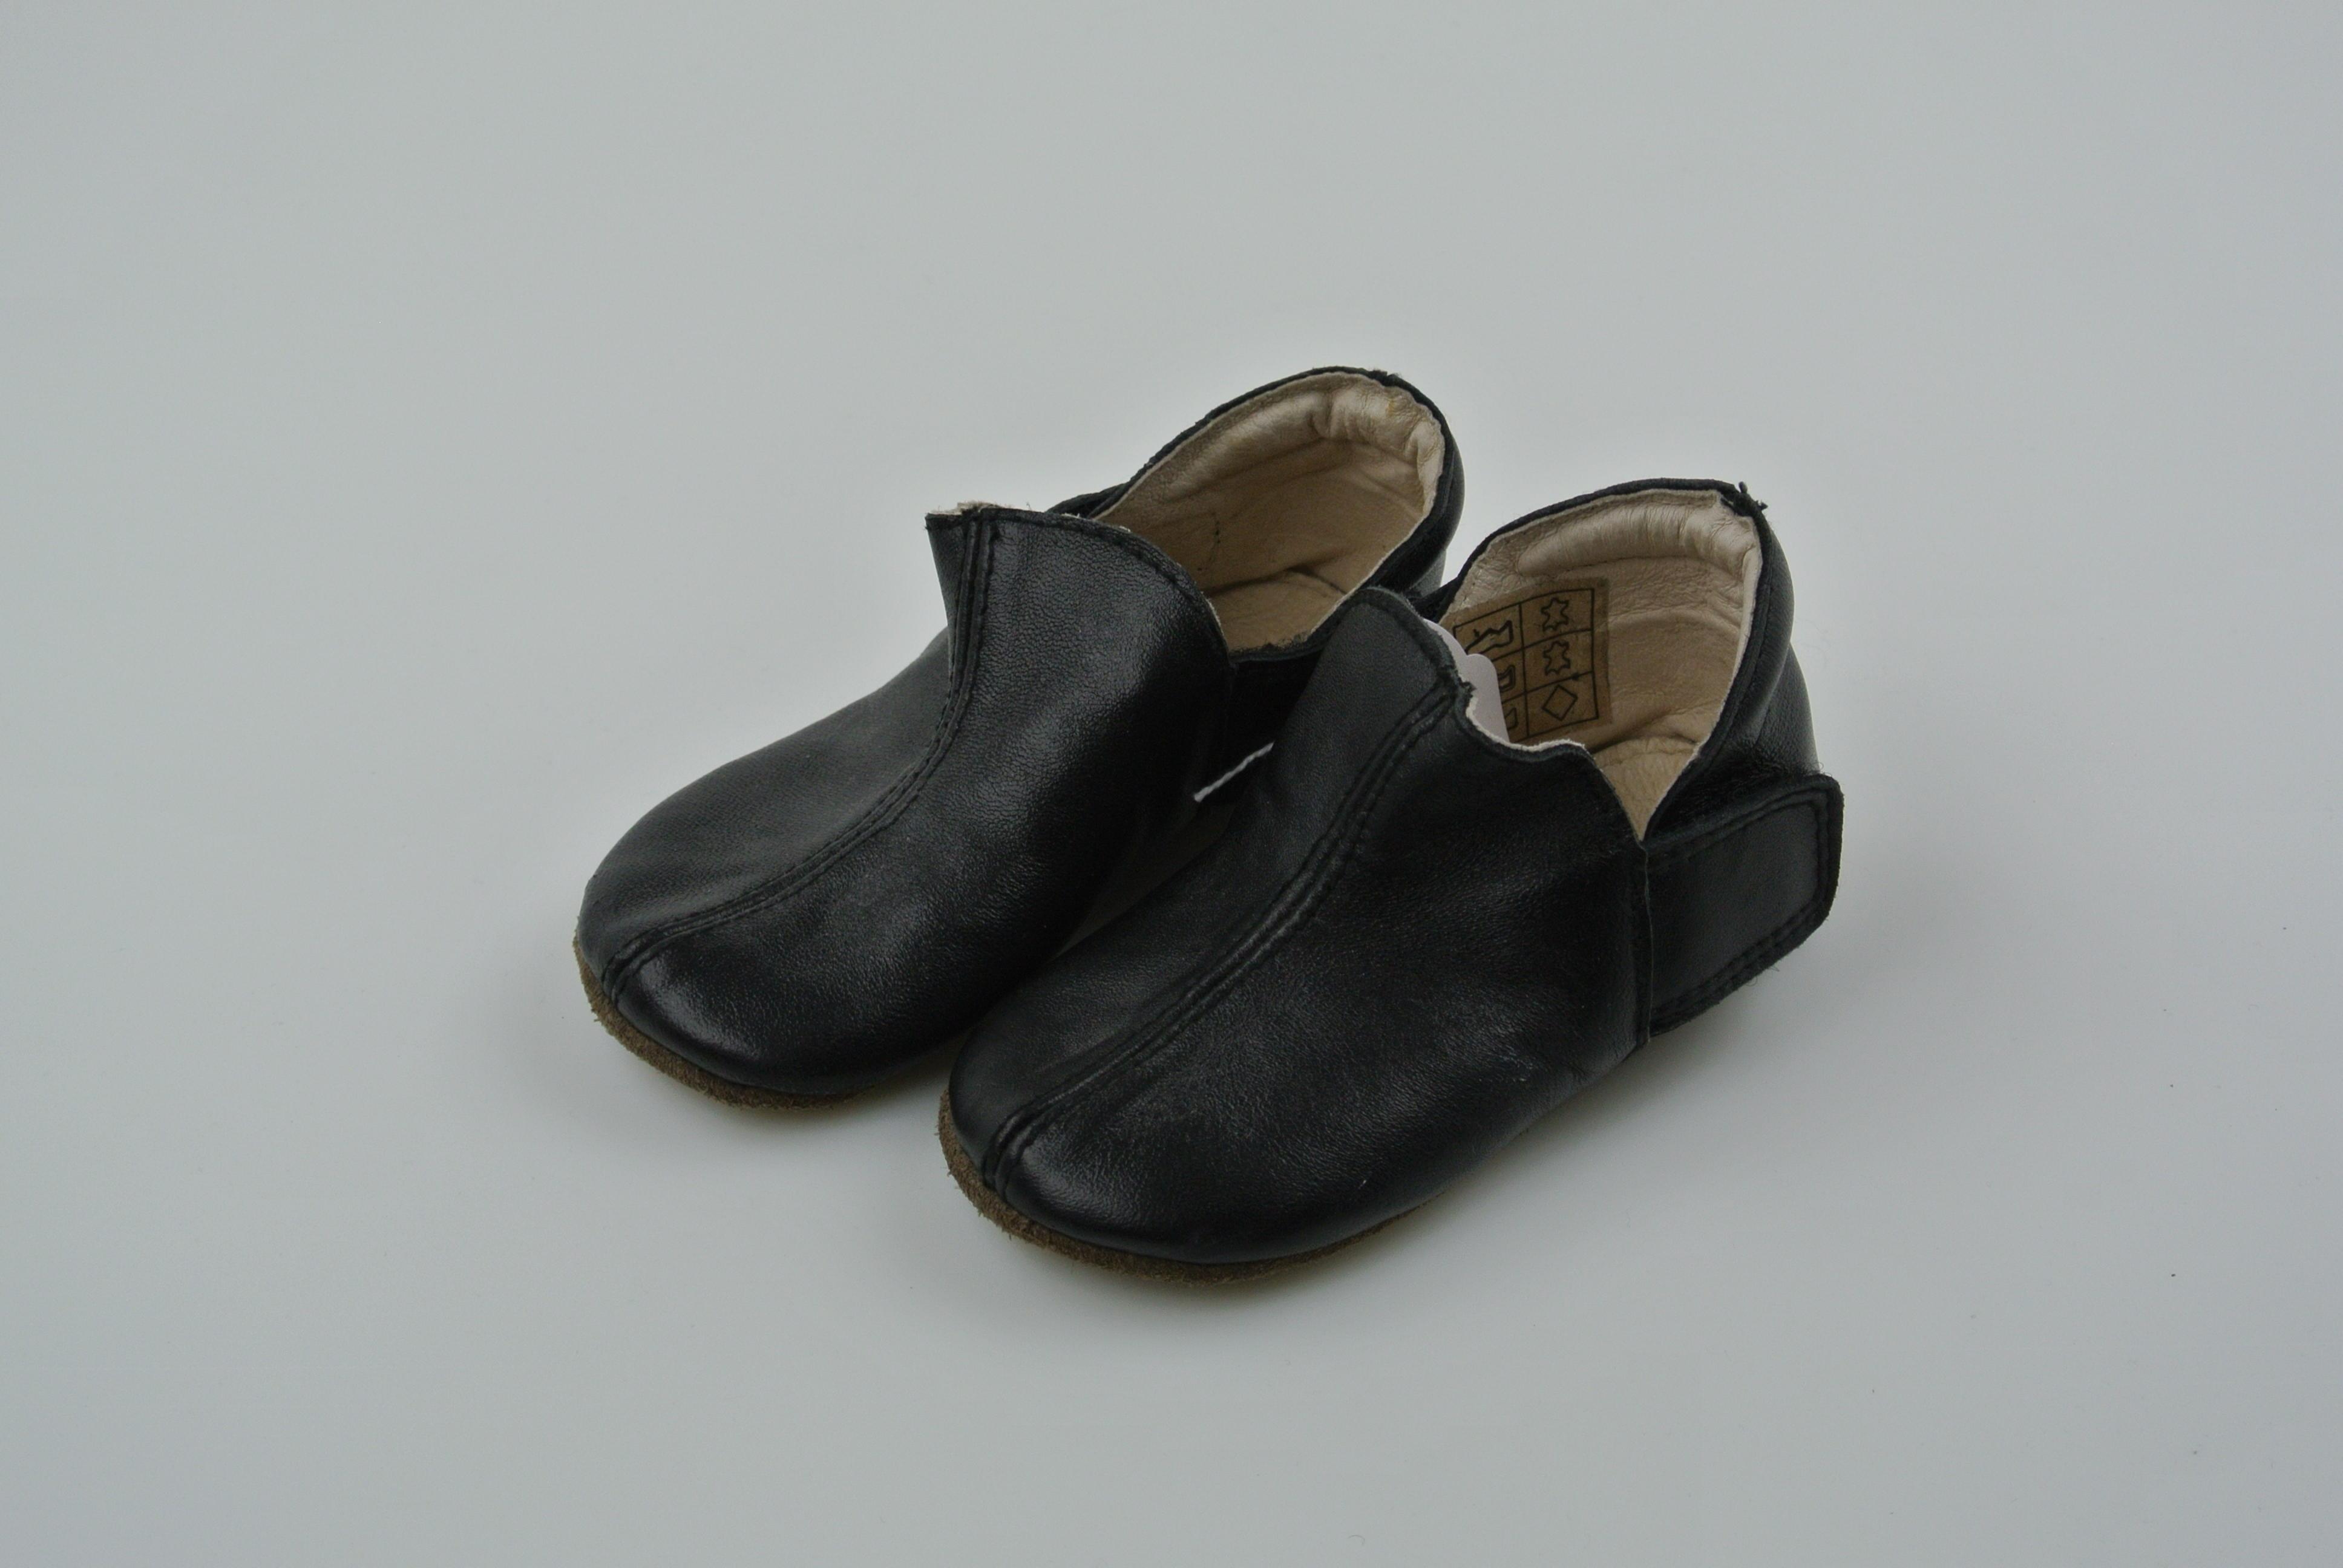 En-fant sko str 20